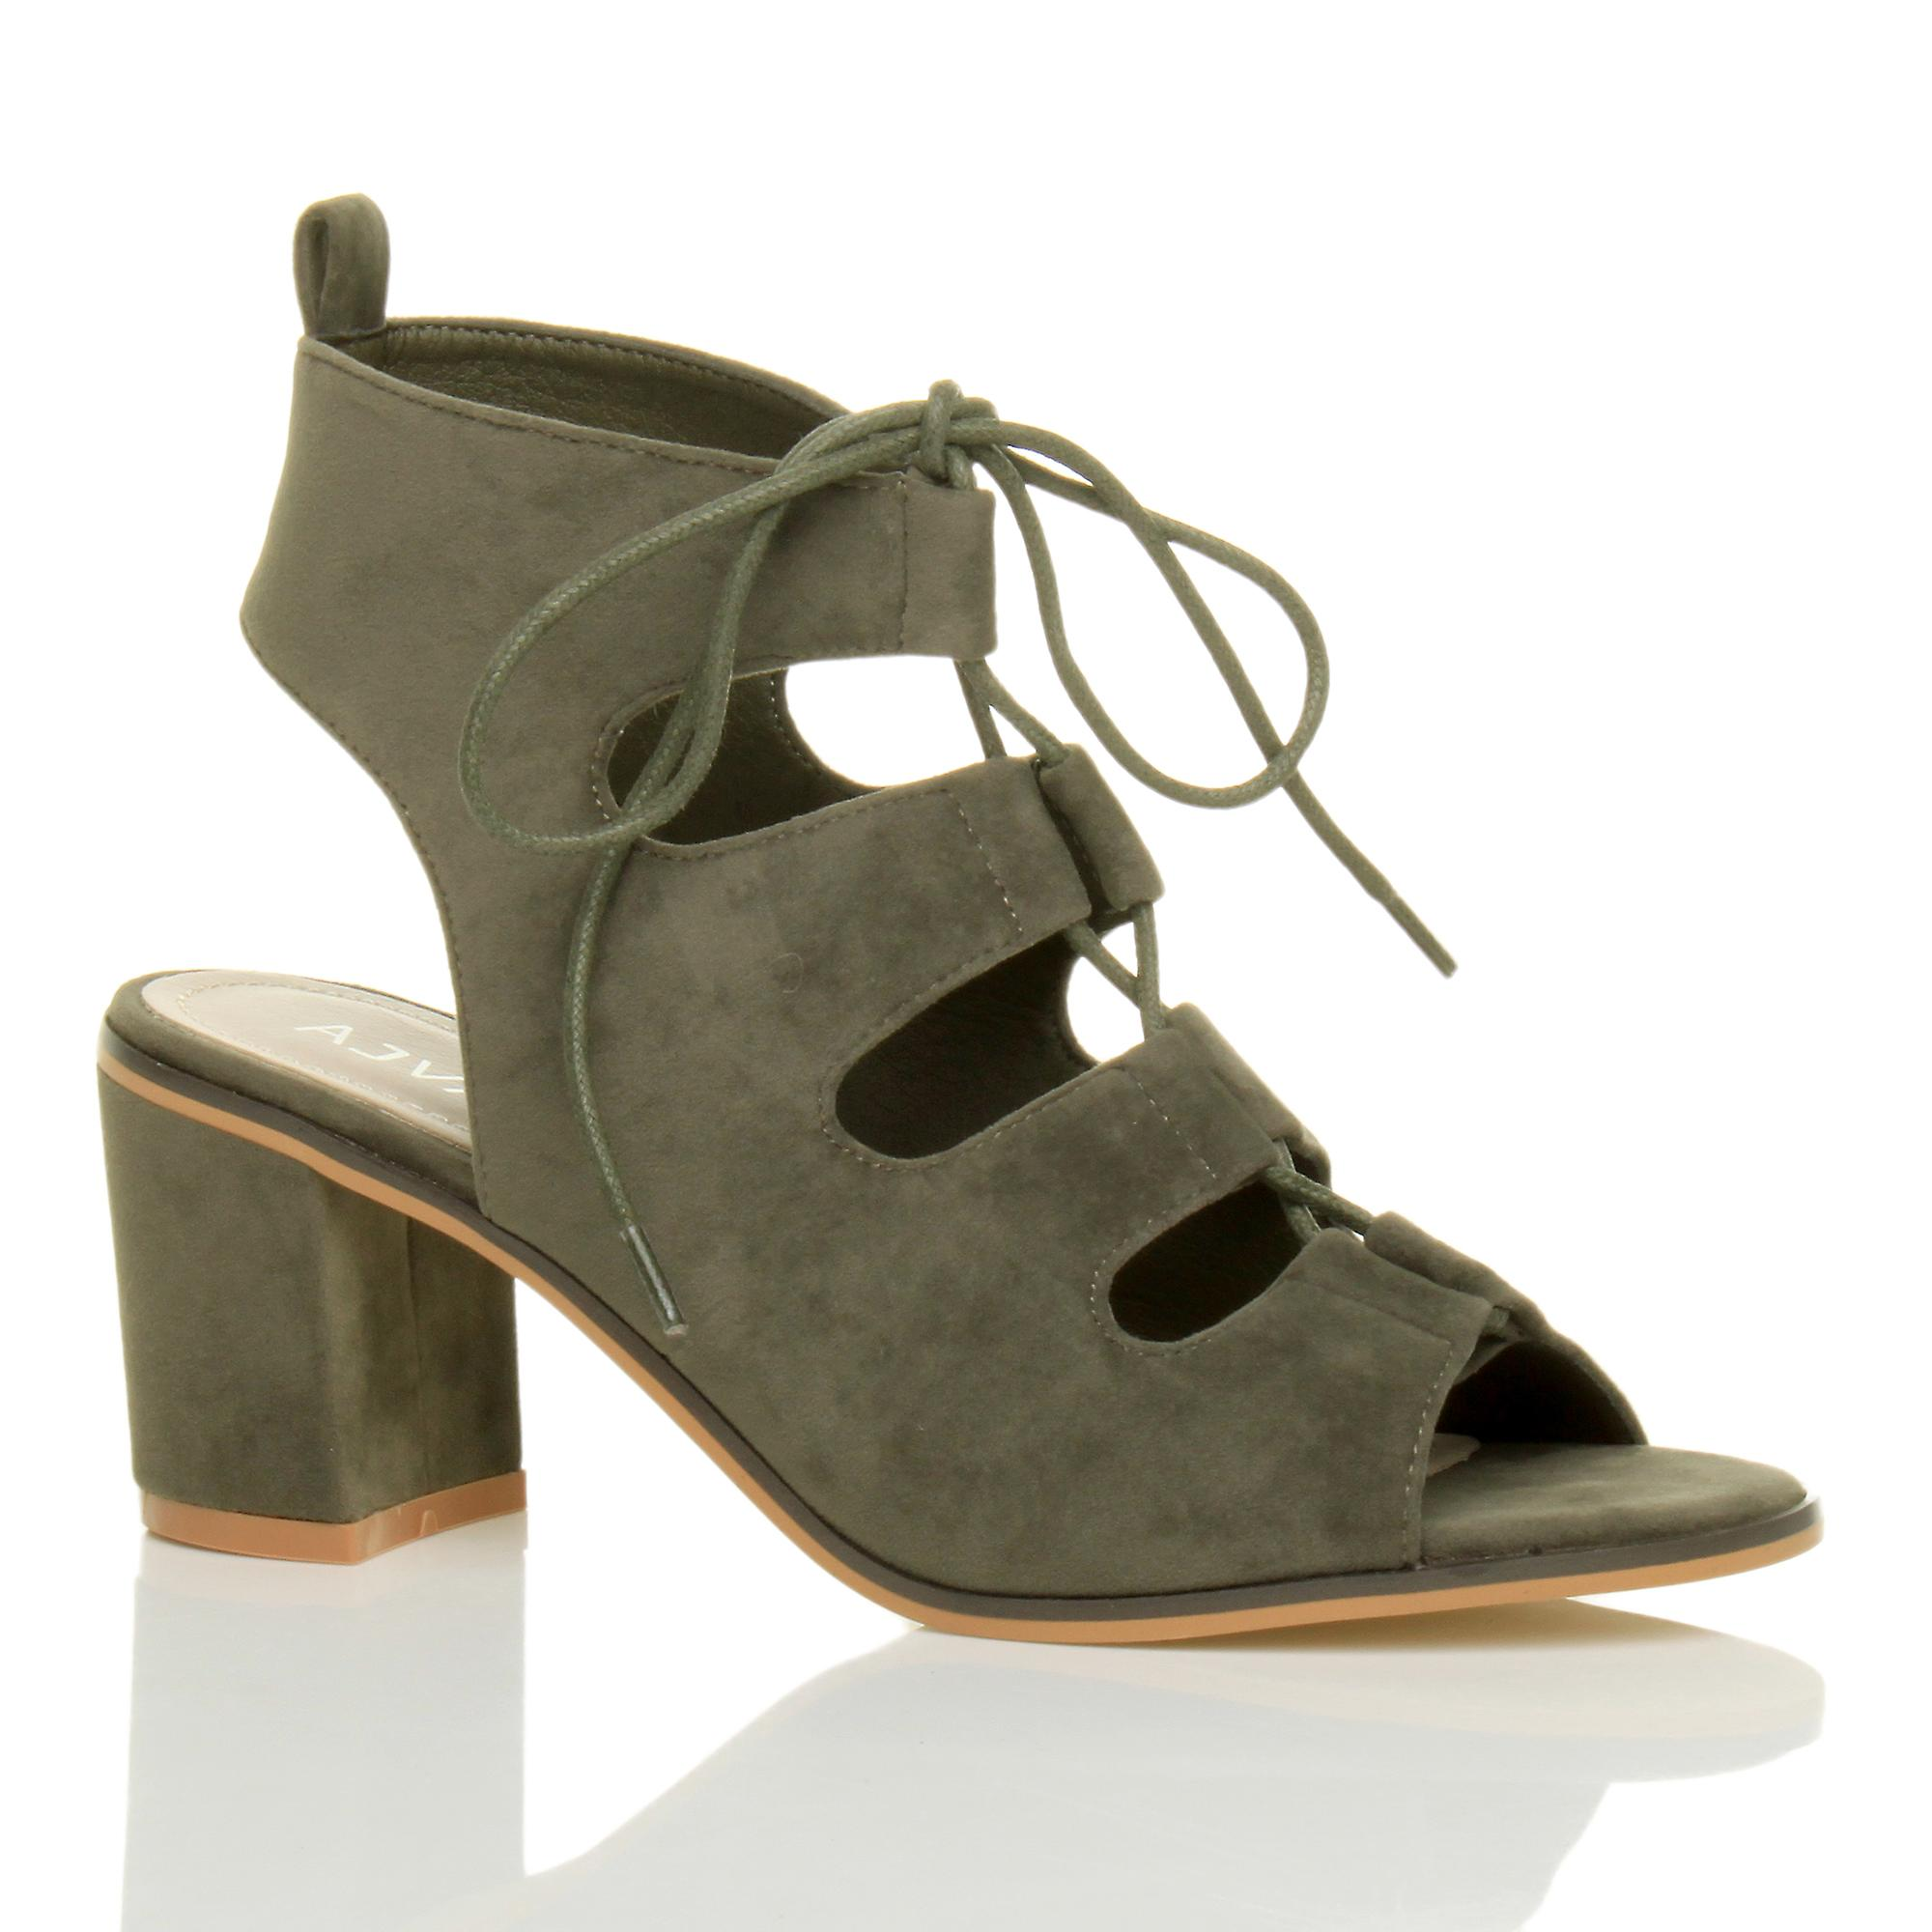 Ajvani Womens Mitte niedrigem Absatz ausgeschnitten Ghillie-Schnürung Peep Toe Stiefeletten Sandalen Schuhe